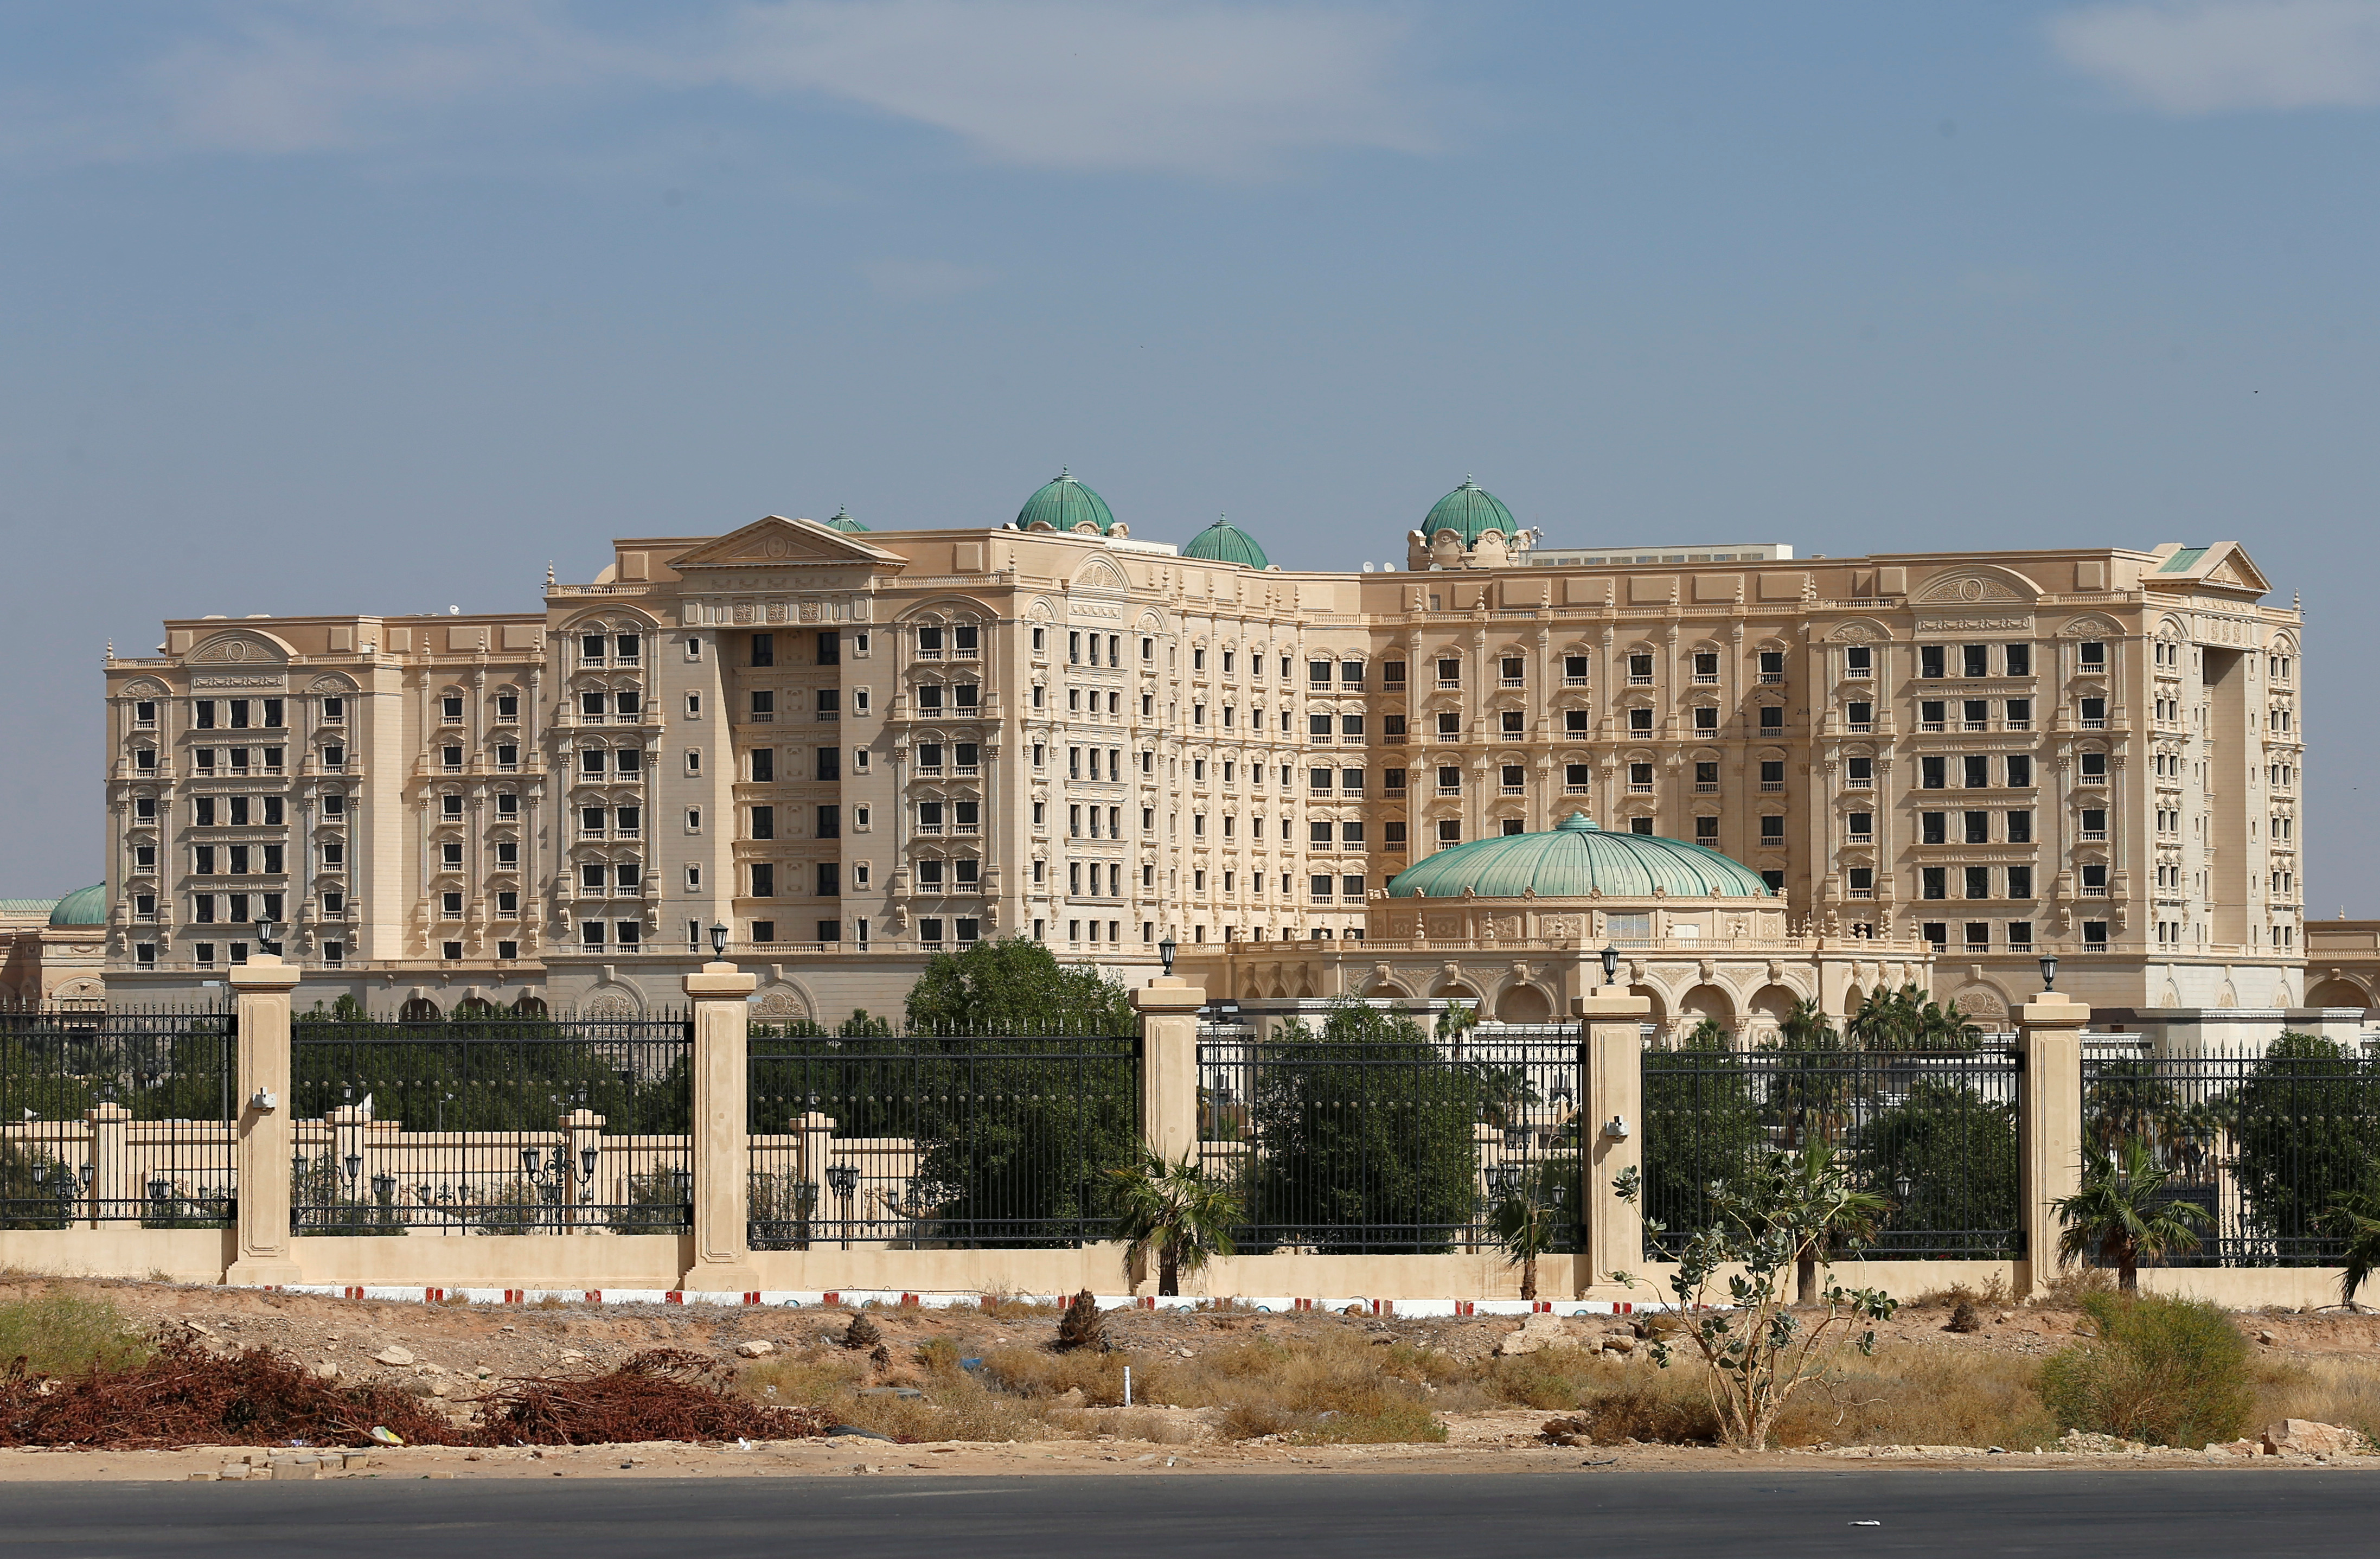 A view shows the Ritz-Carlton hotel in the diplomatic quarter of Riyadh, Saudi Arabia, November 5, 2017. REUTERS/Faisal Al Nasser - RC15C1BED940